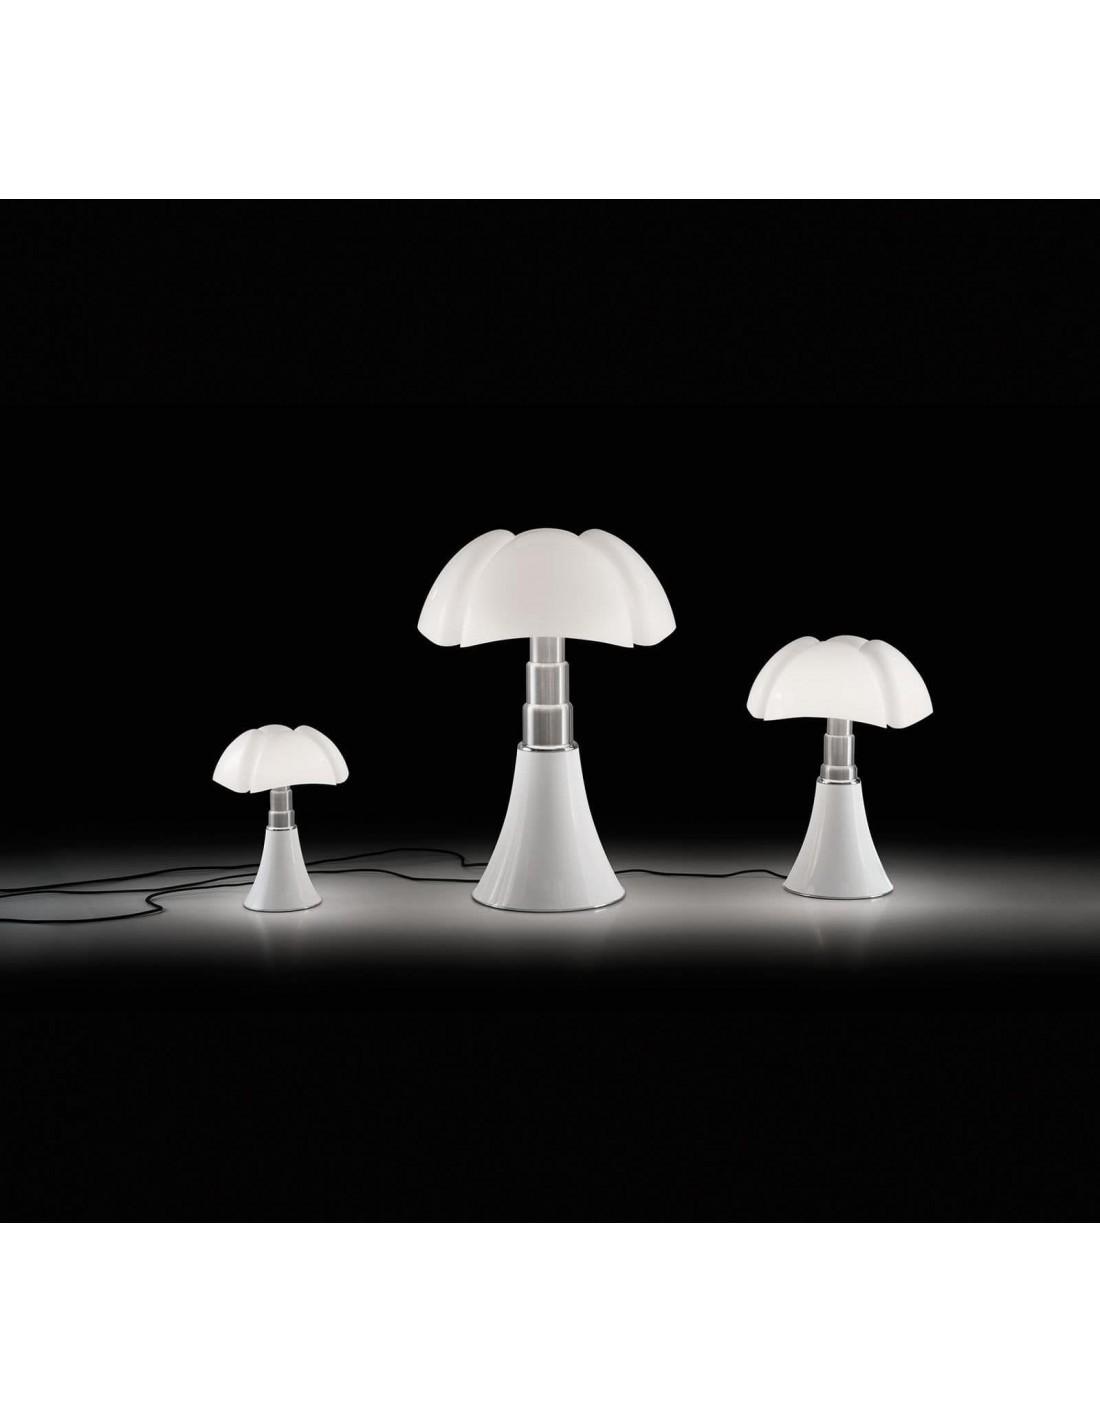 lampe de table pipistrello blanche les diff rentes tailles. Black Bedroom Furniture Sets. Home Design Ideas